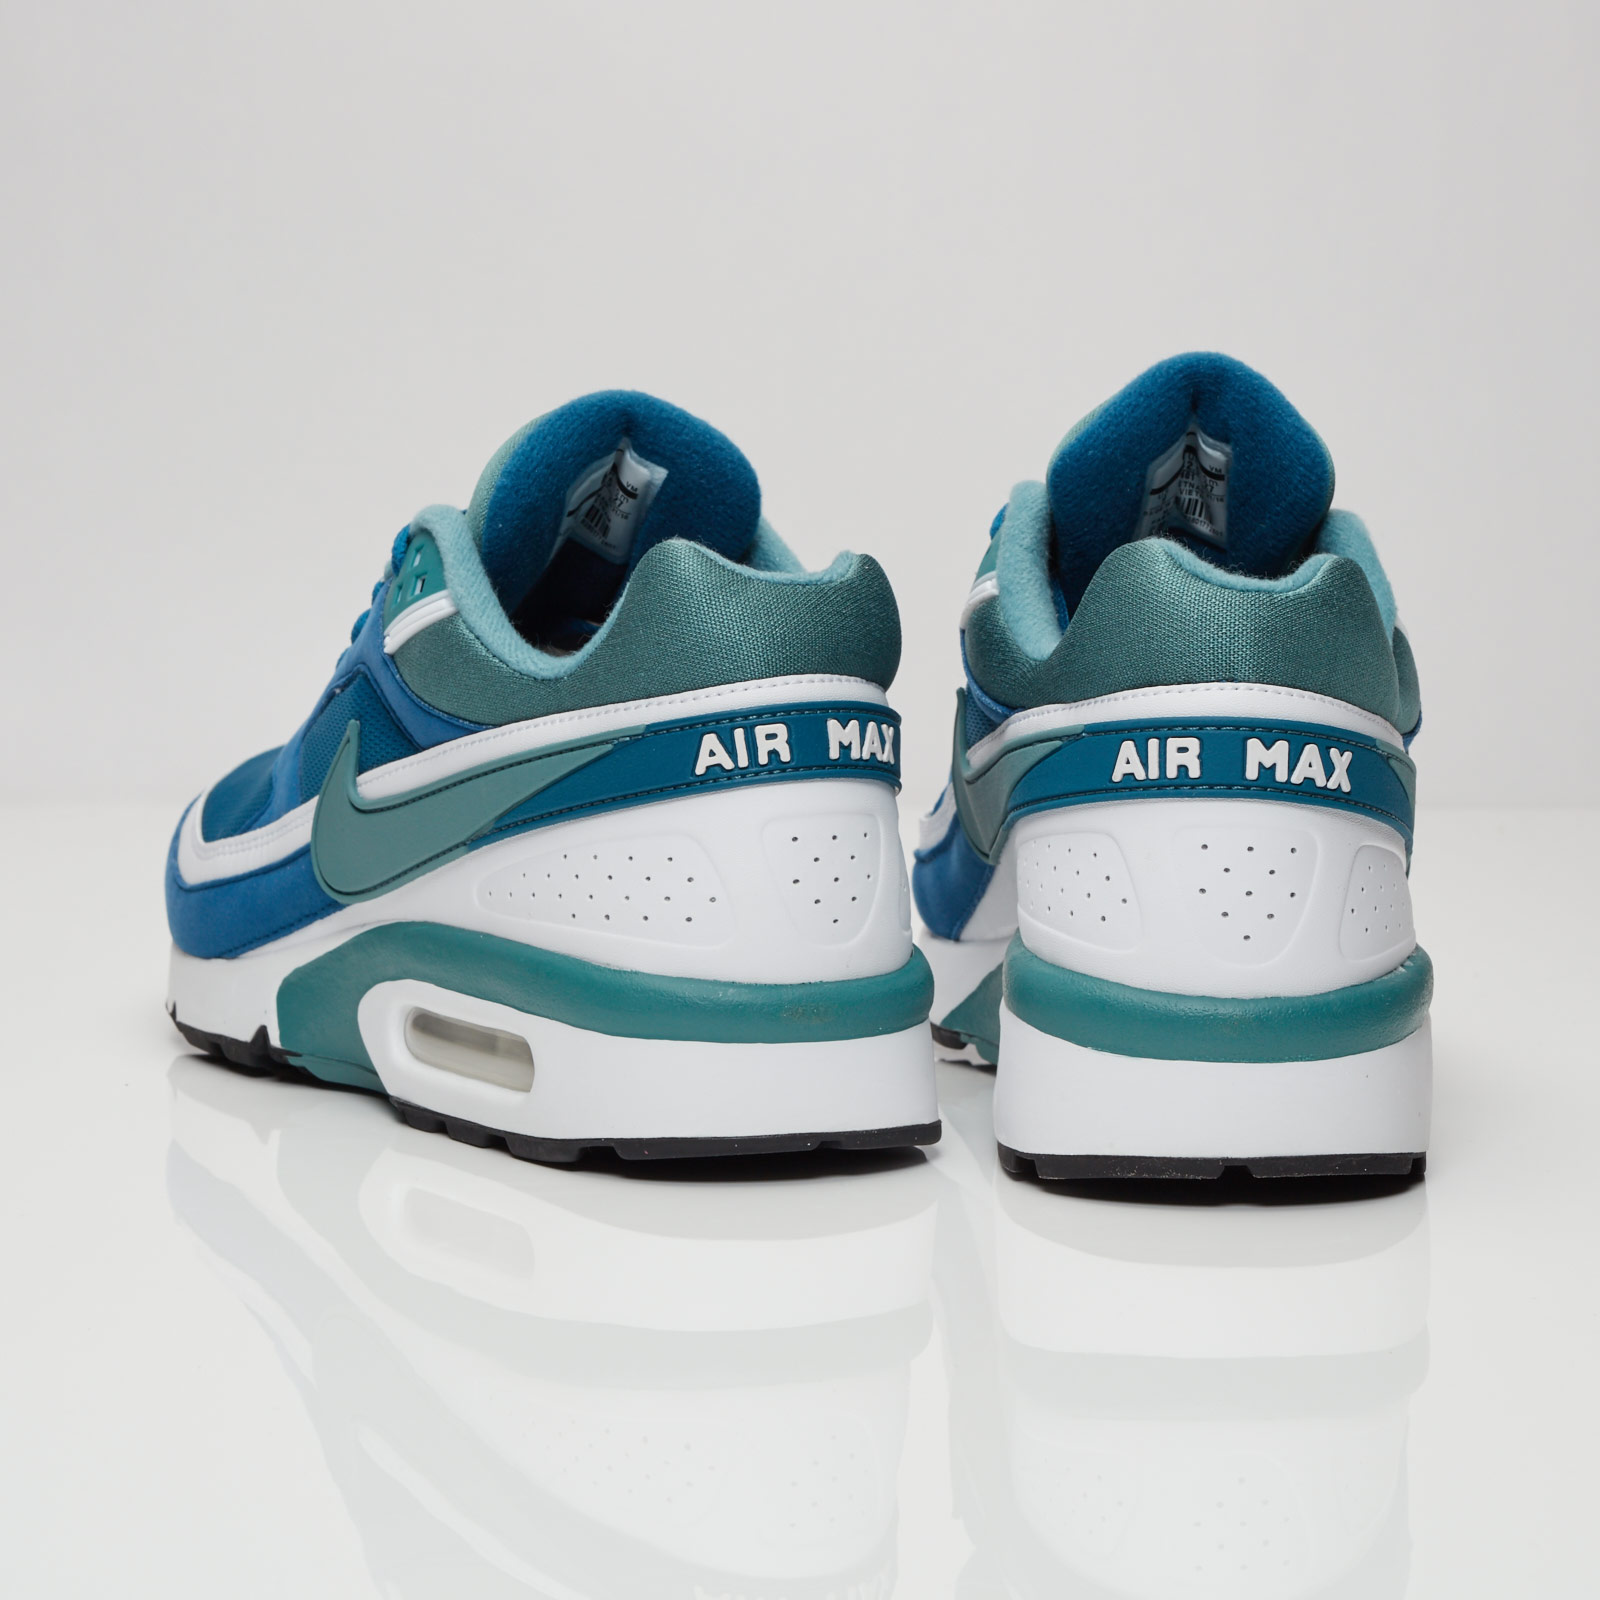 d228d149ad Nike Air Max BW OG - 819522-401 - Sneakersnstuff | sneakers & streetwear  online since 1999